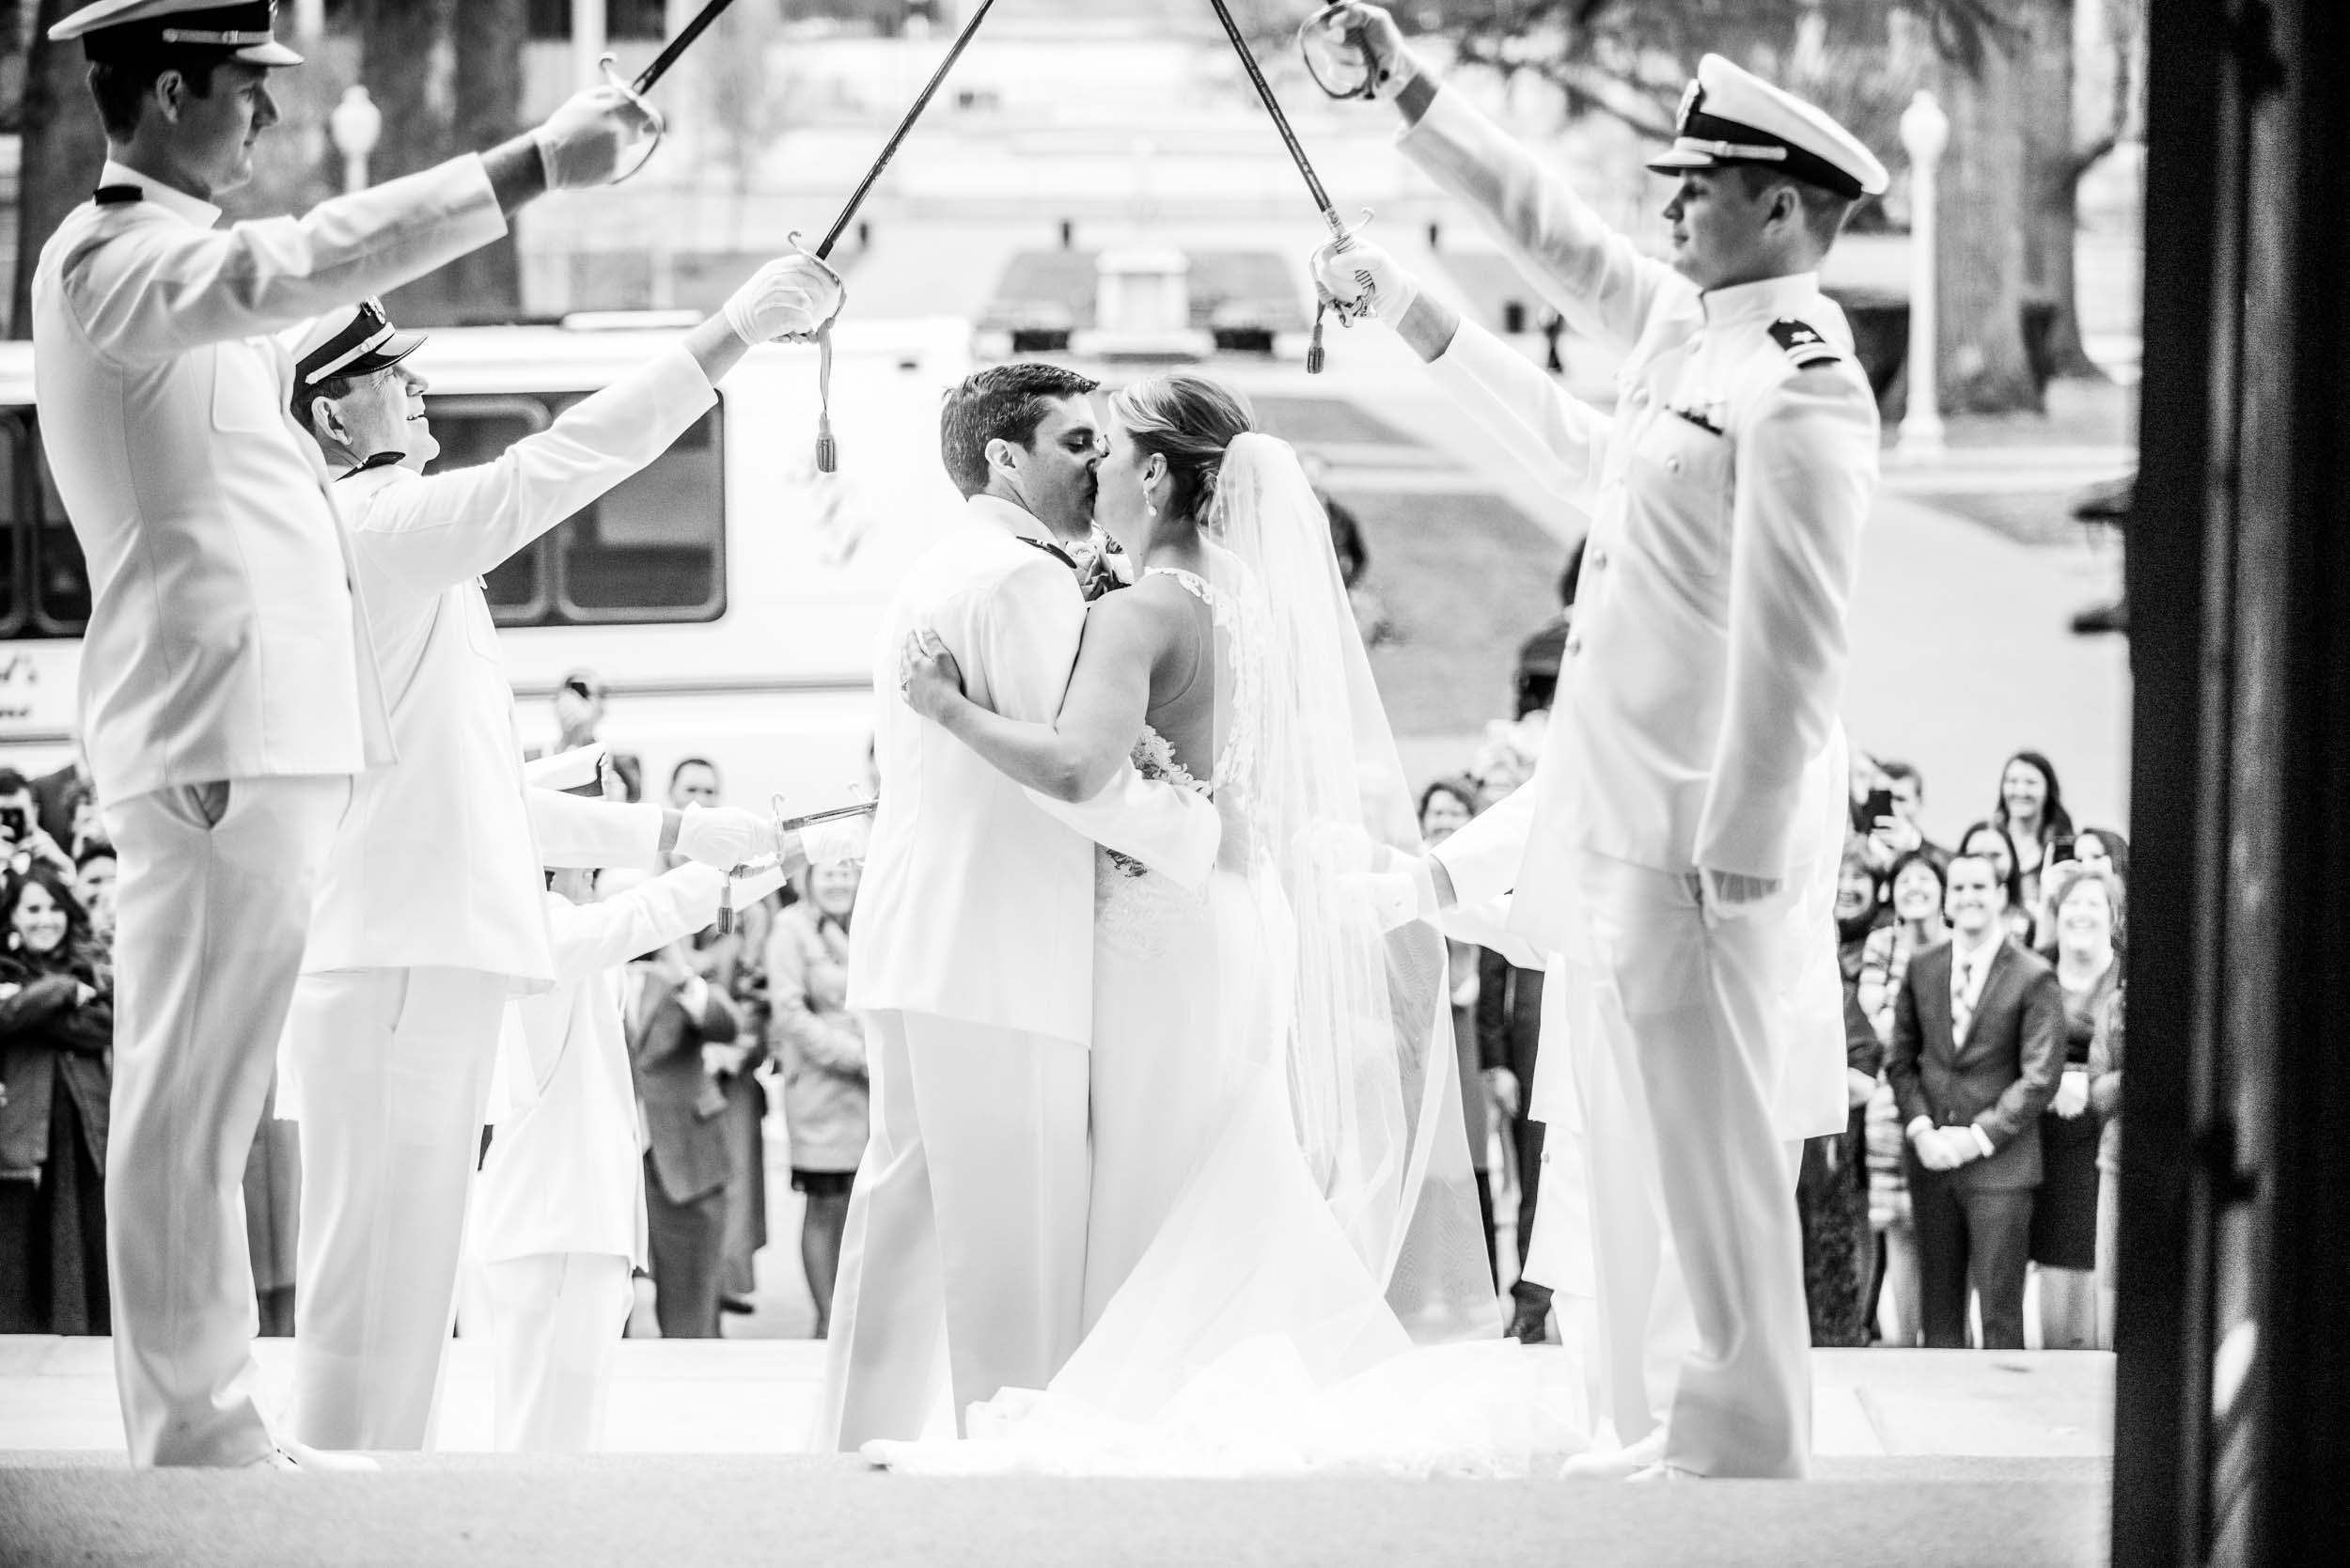 dc+metro+wedding+photographer+vadym+guliuk+photography+wedding+ceremony-2043.jpg